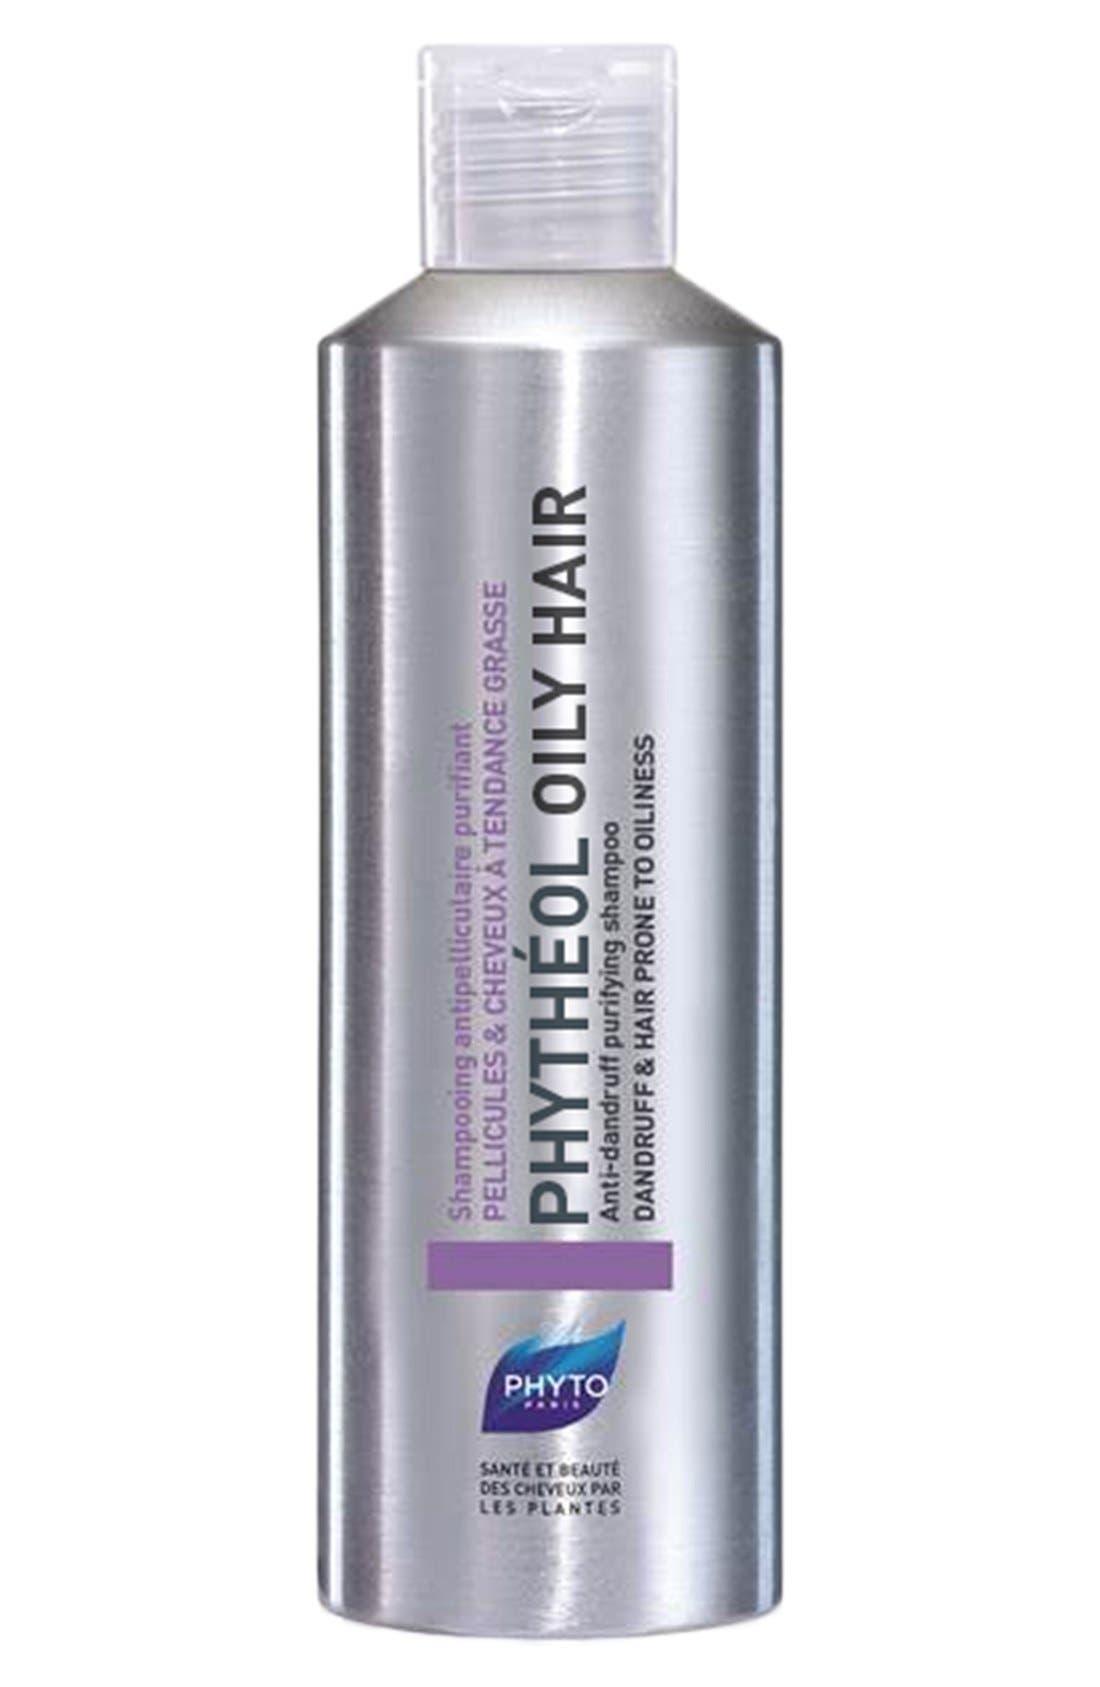 Phythéol Oily Hair Anti-Dandruff Purifying Shampoo,                             Main thumbnail 1, color,                             NO COLOR